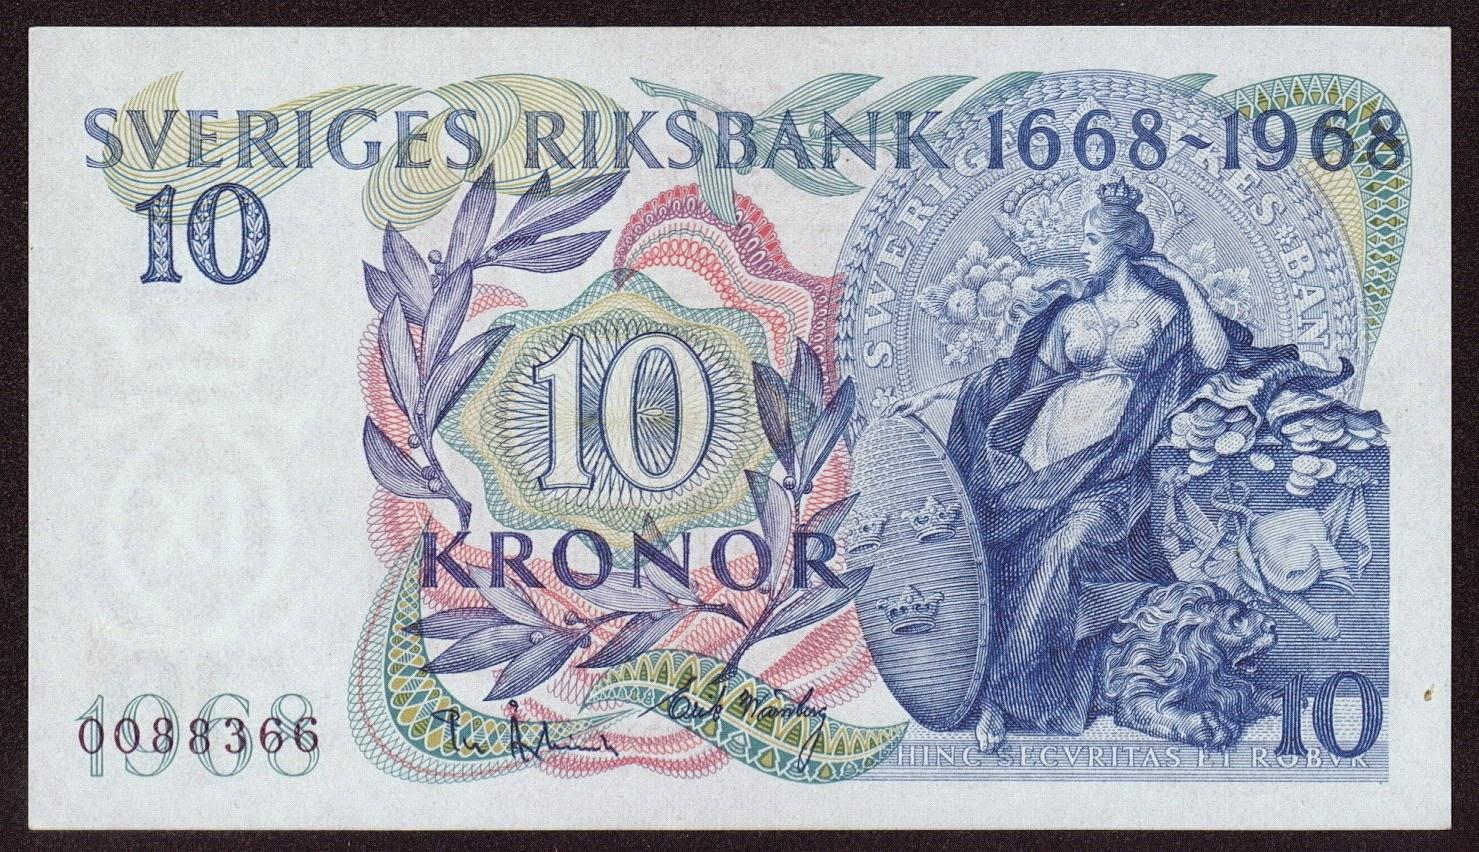 Sweden Currency 10 Swedish Krona Commemorative banknote 300th Anniversary of Sveriges Riksbank 1668-1968